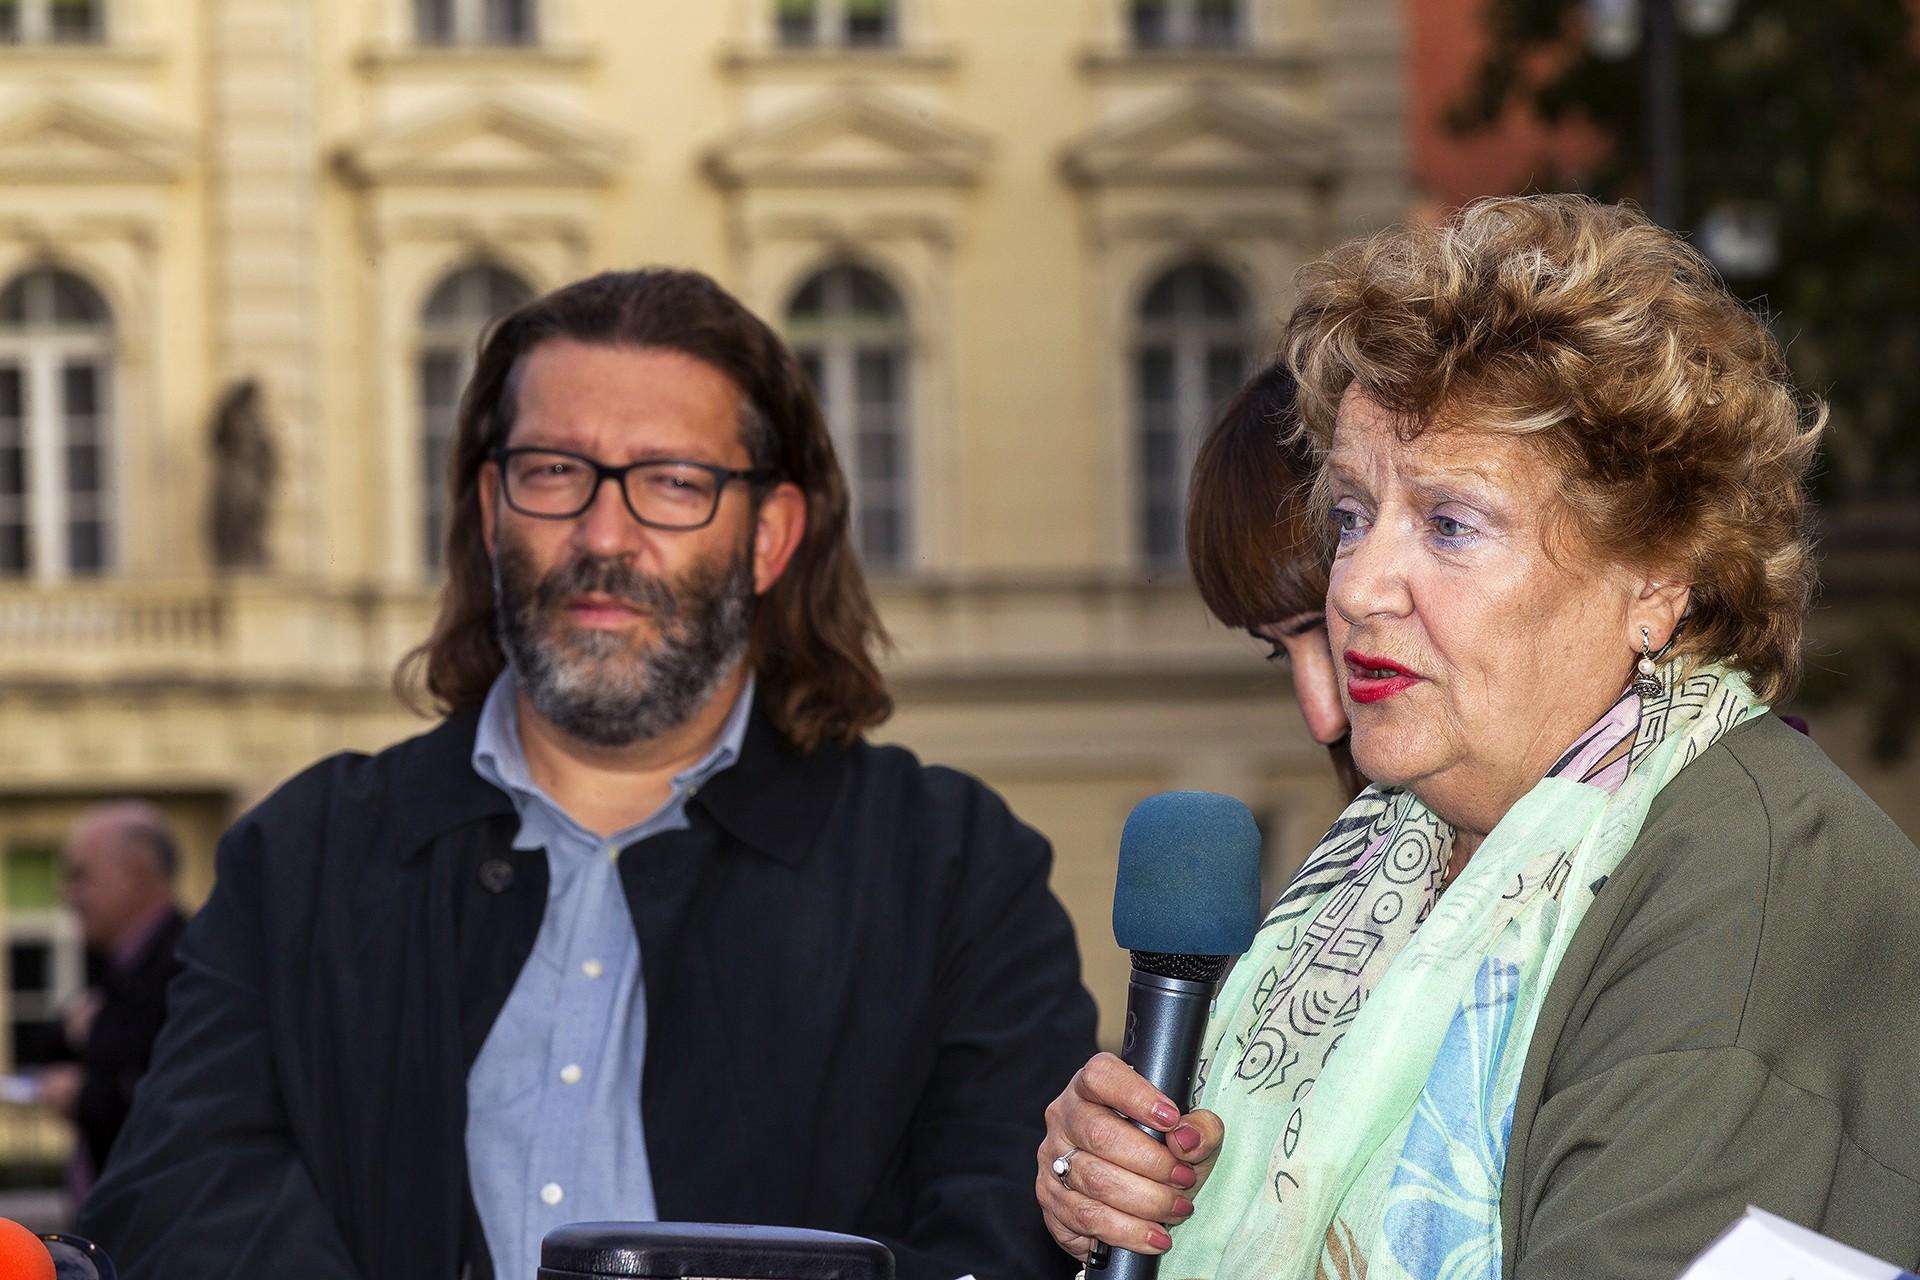 Predstavljeni knjiga i dvostruki CD objavljeni u čast sopranistice Ljiljane Molnar-Talajić